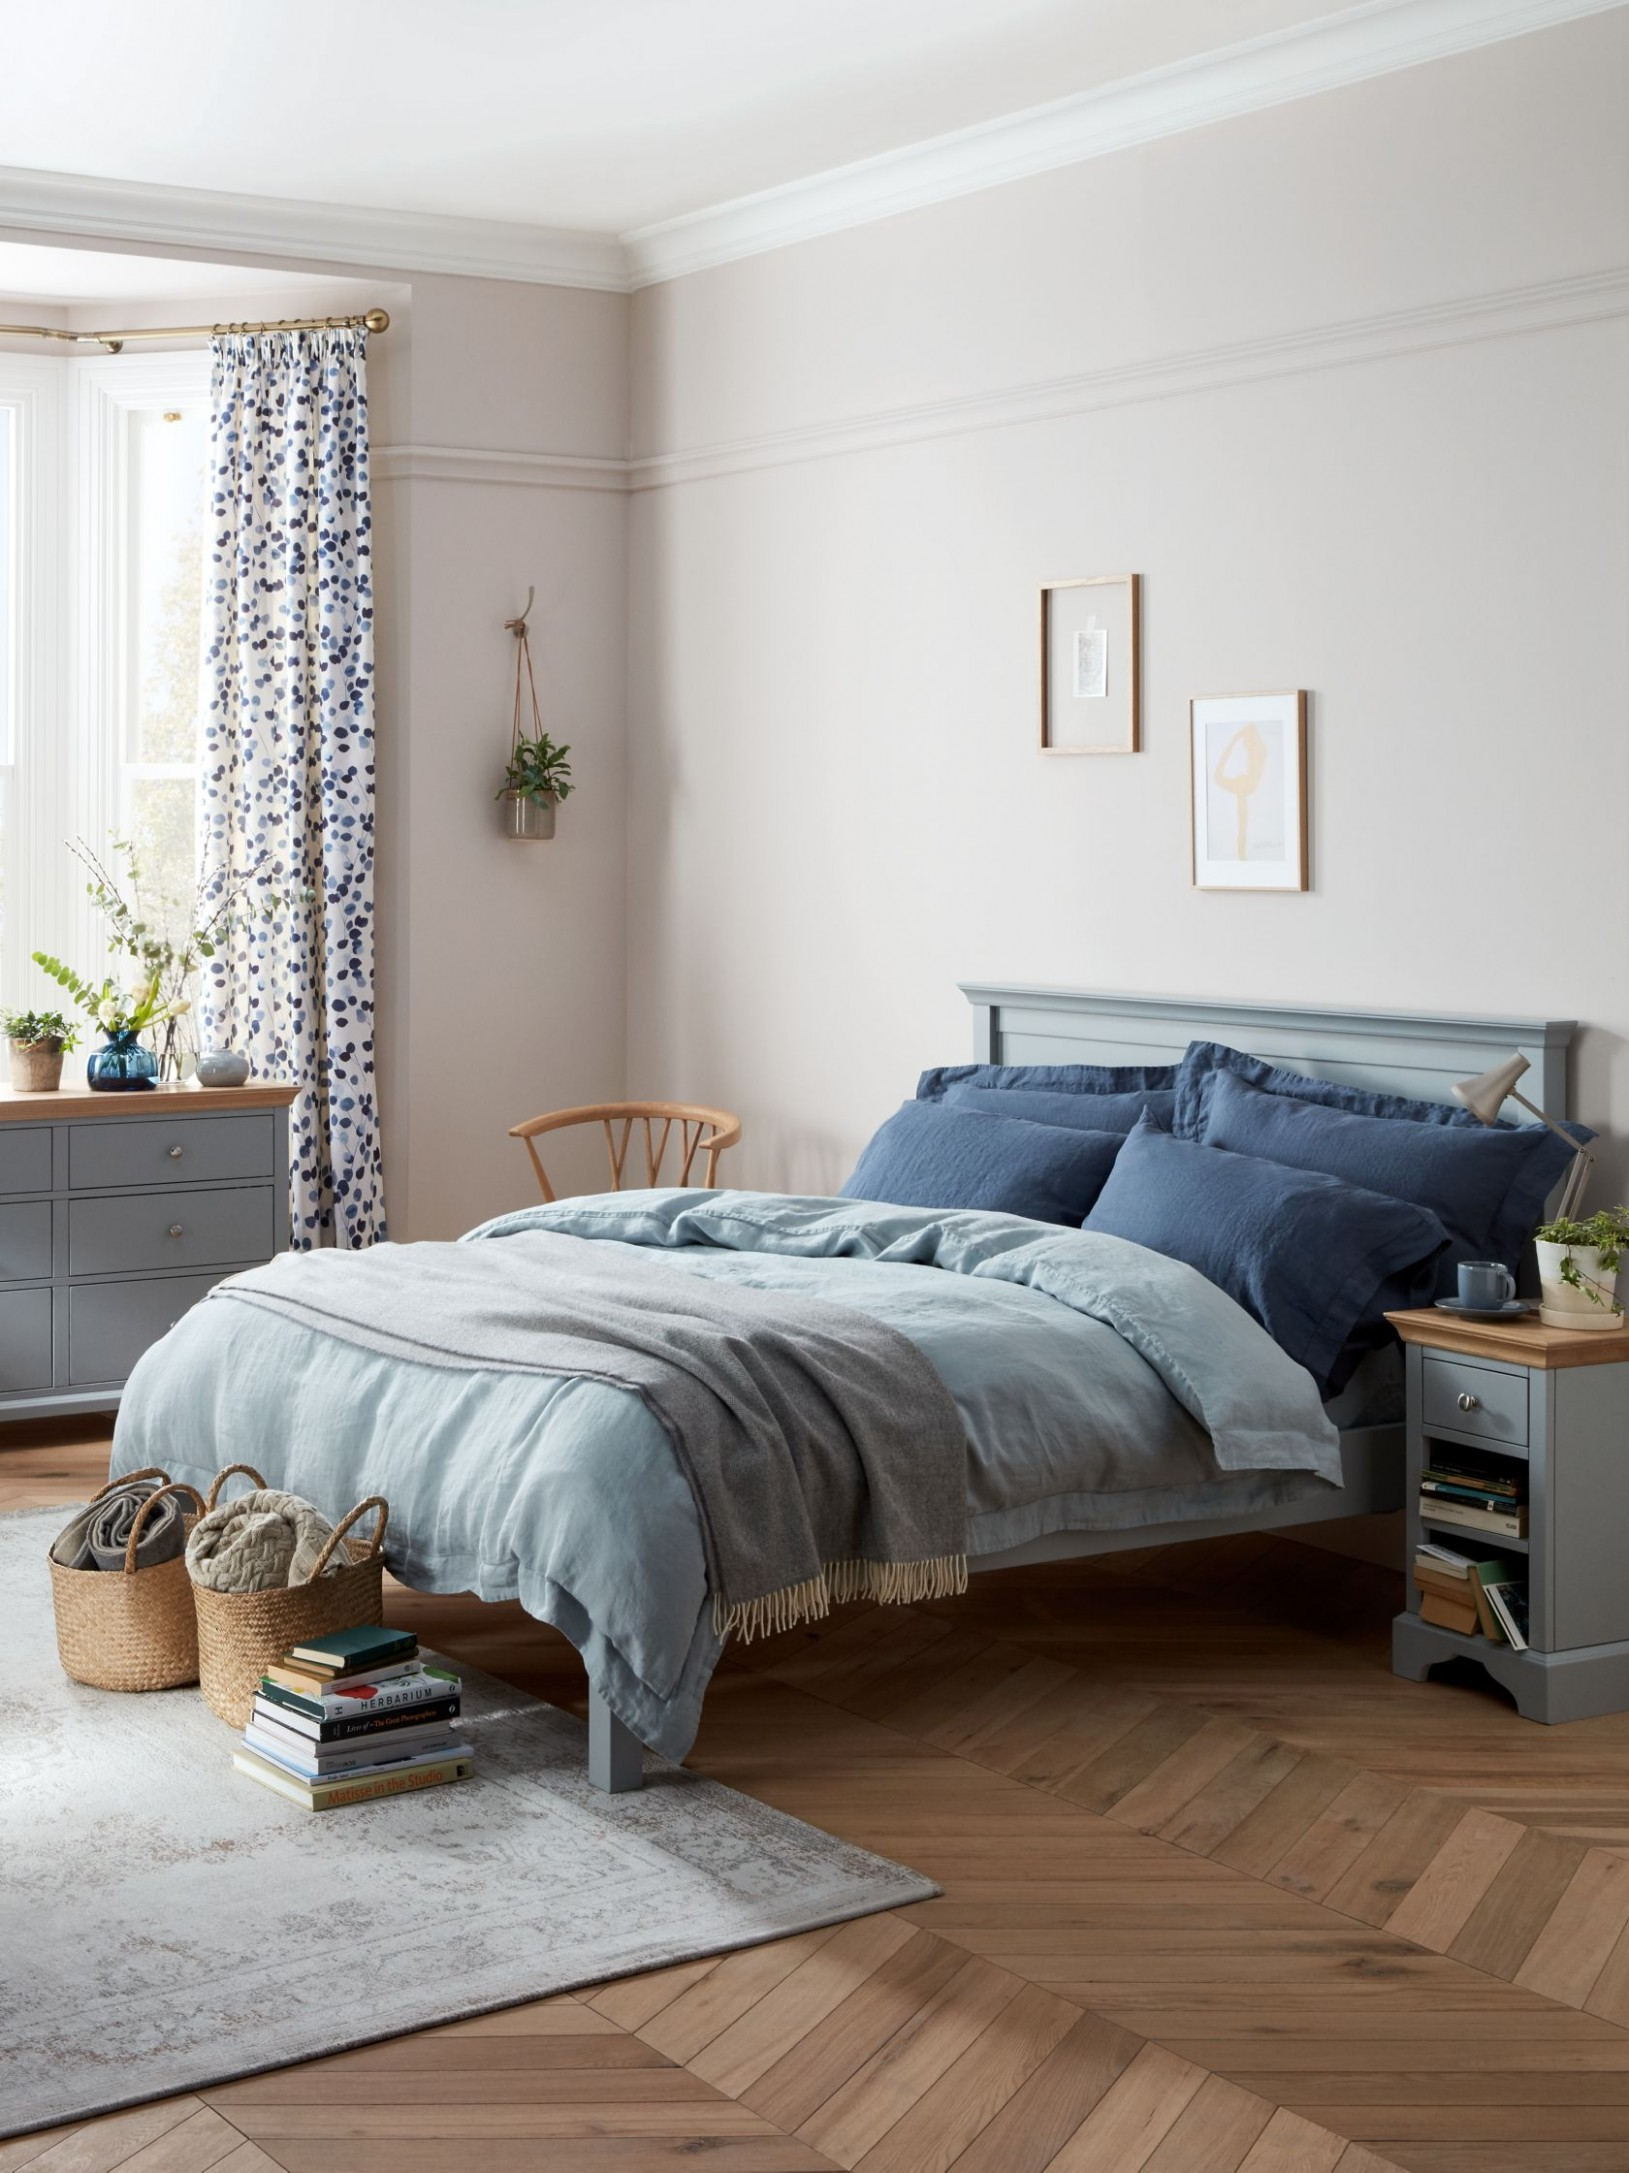 John Lewis & Partners Lymington Bedroom Range at John Lewis & Partners - Bedroom Ideas John Lewis